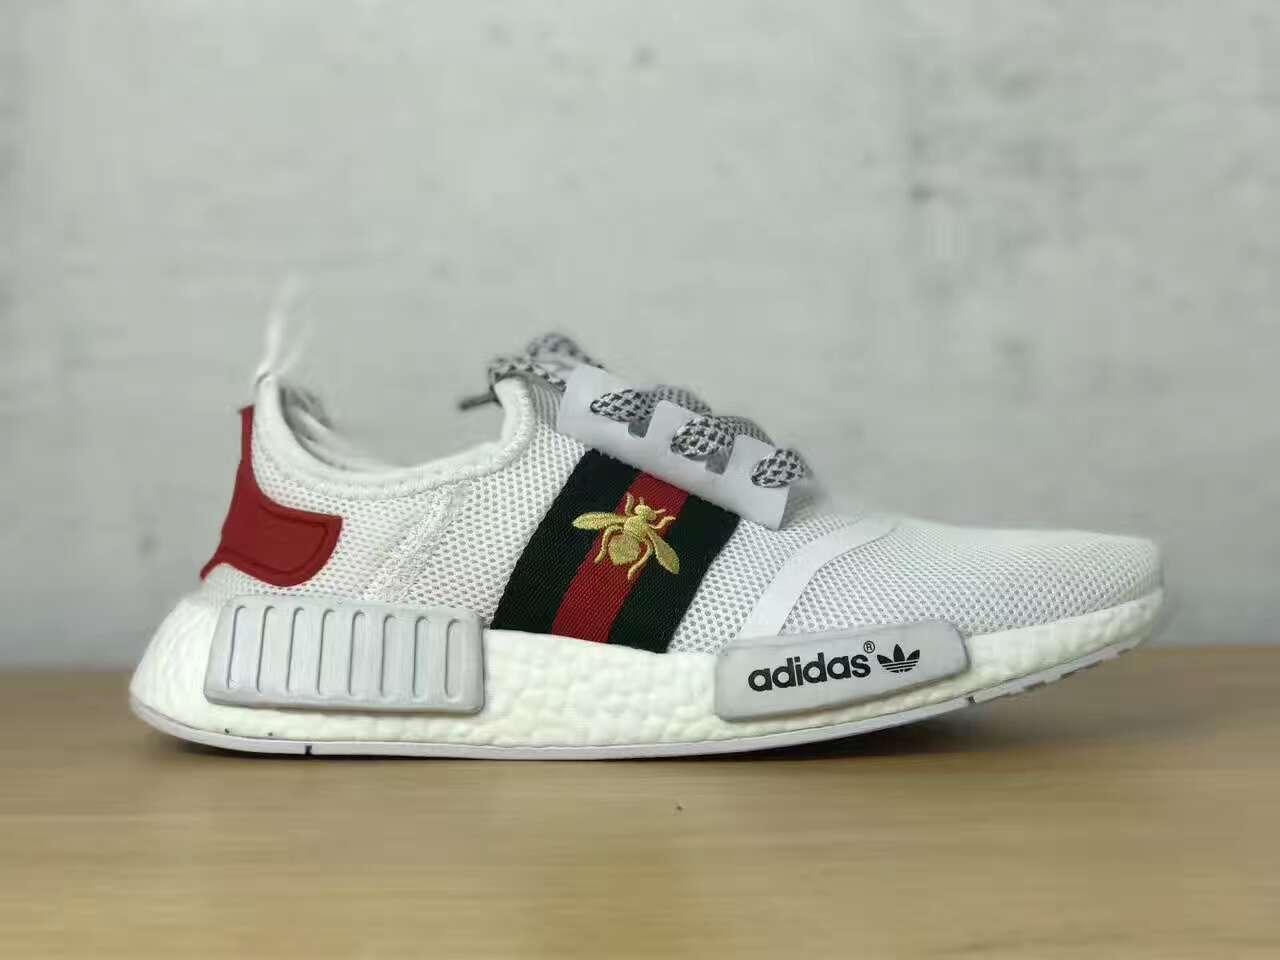 adidas and gucci nmd Shop Clothing